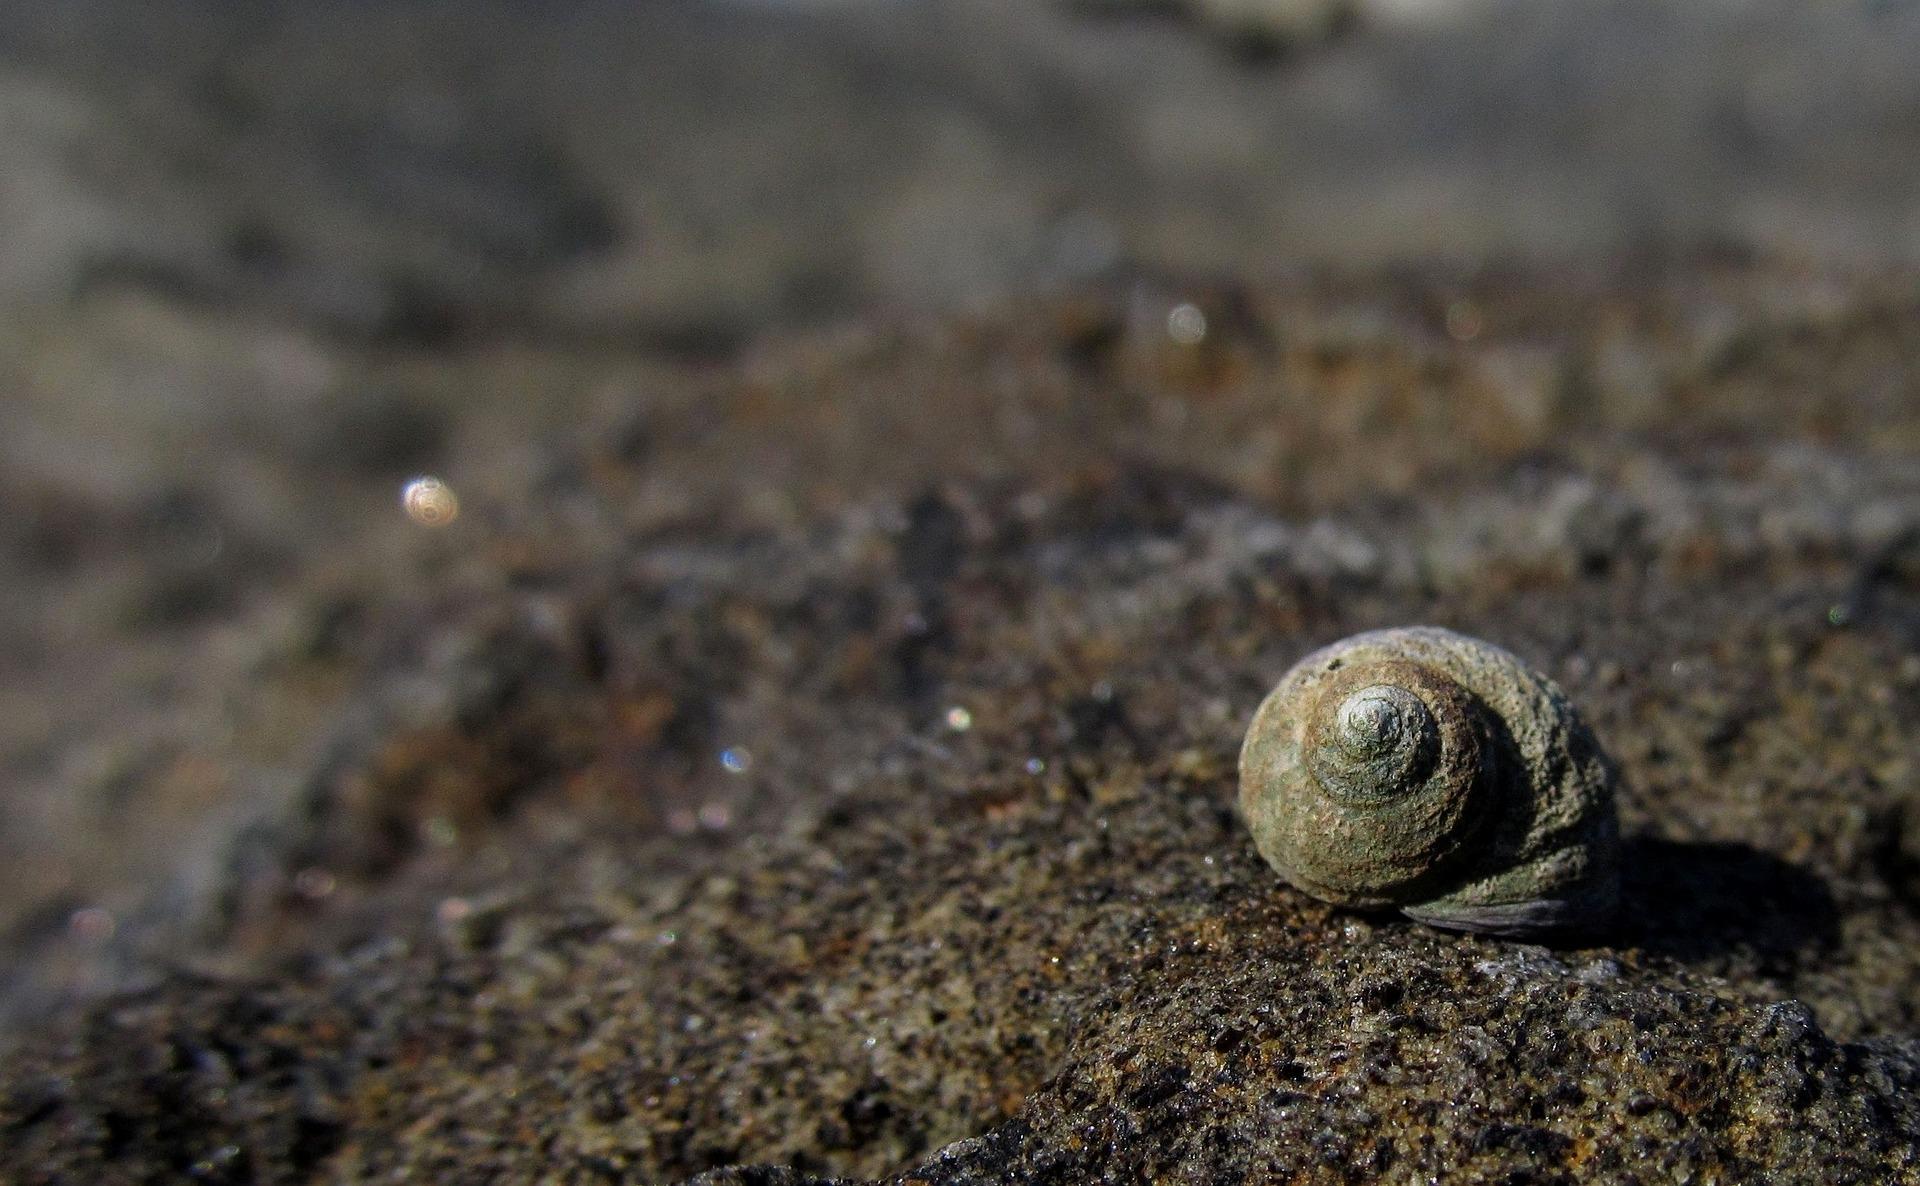 shell-987602_1920